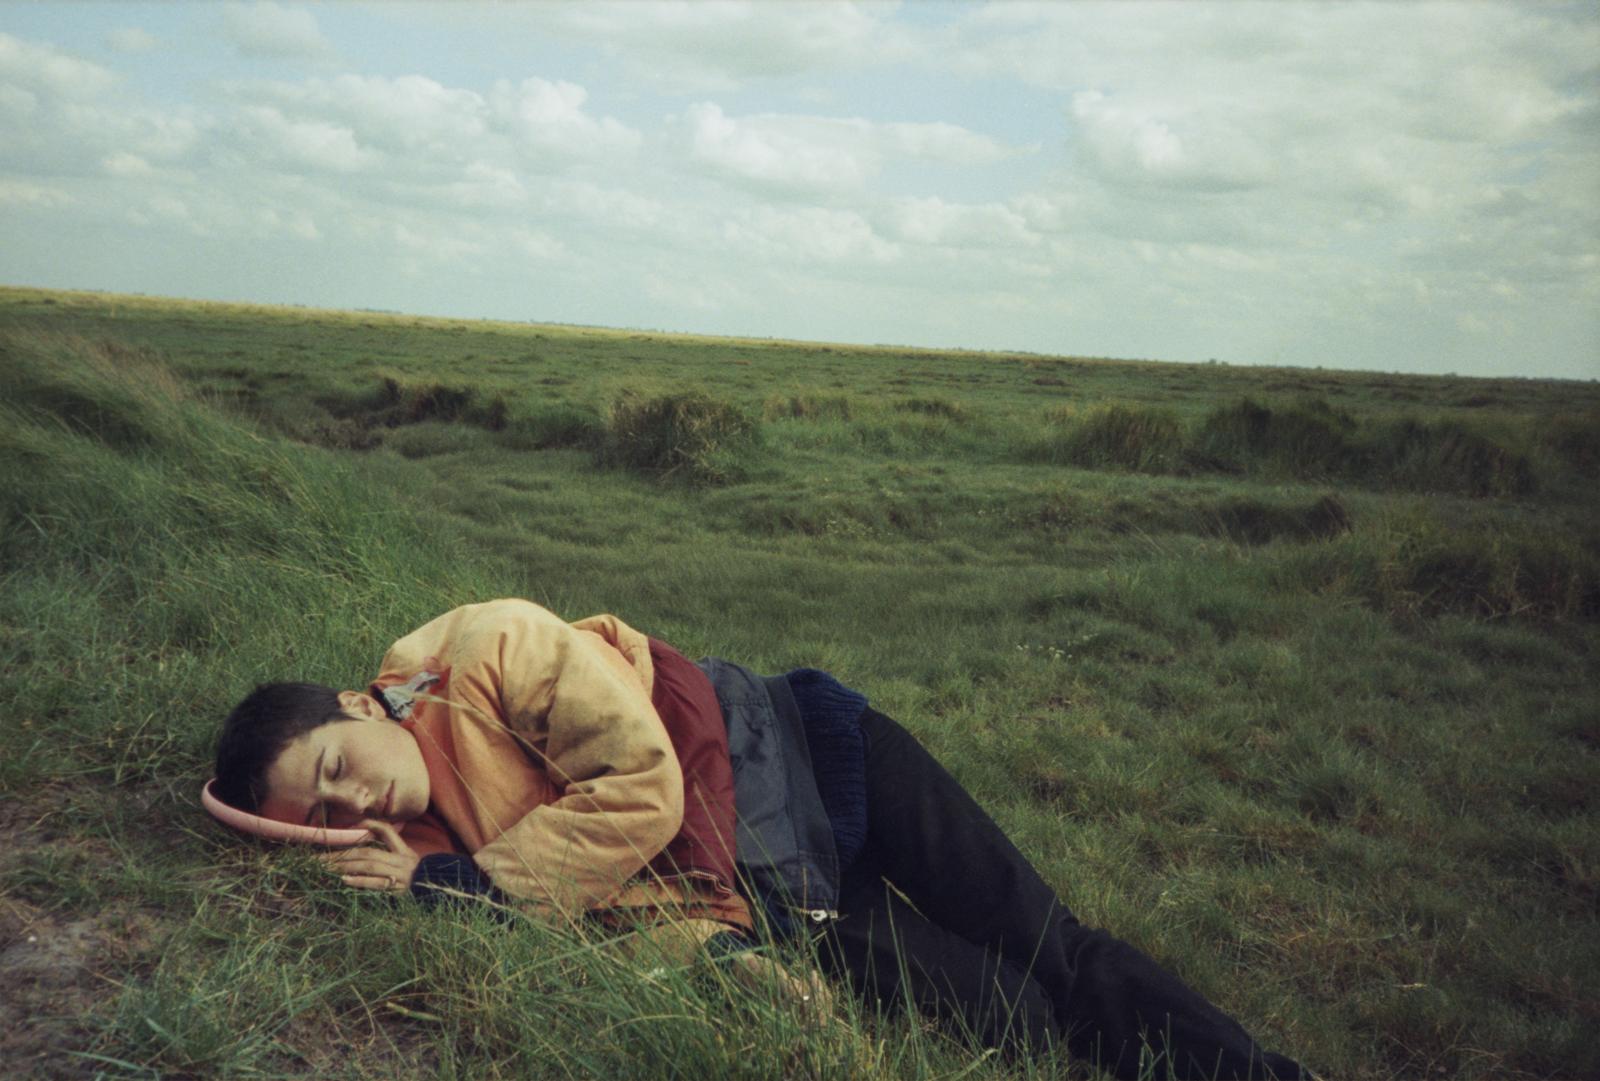 Vinca Petersen: Ali & Frisbee, 'No System', 1999